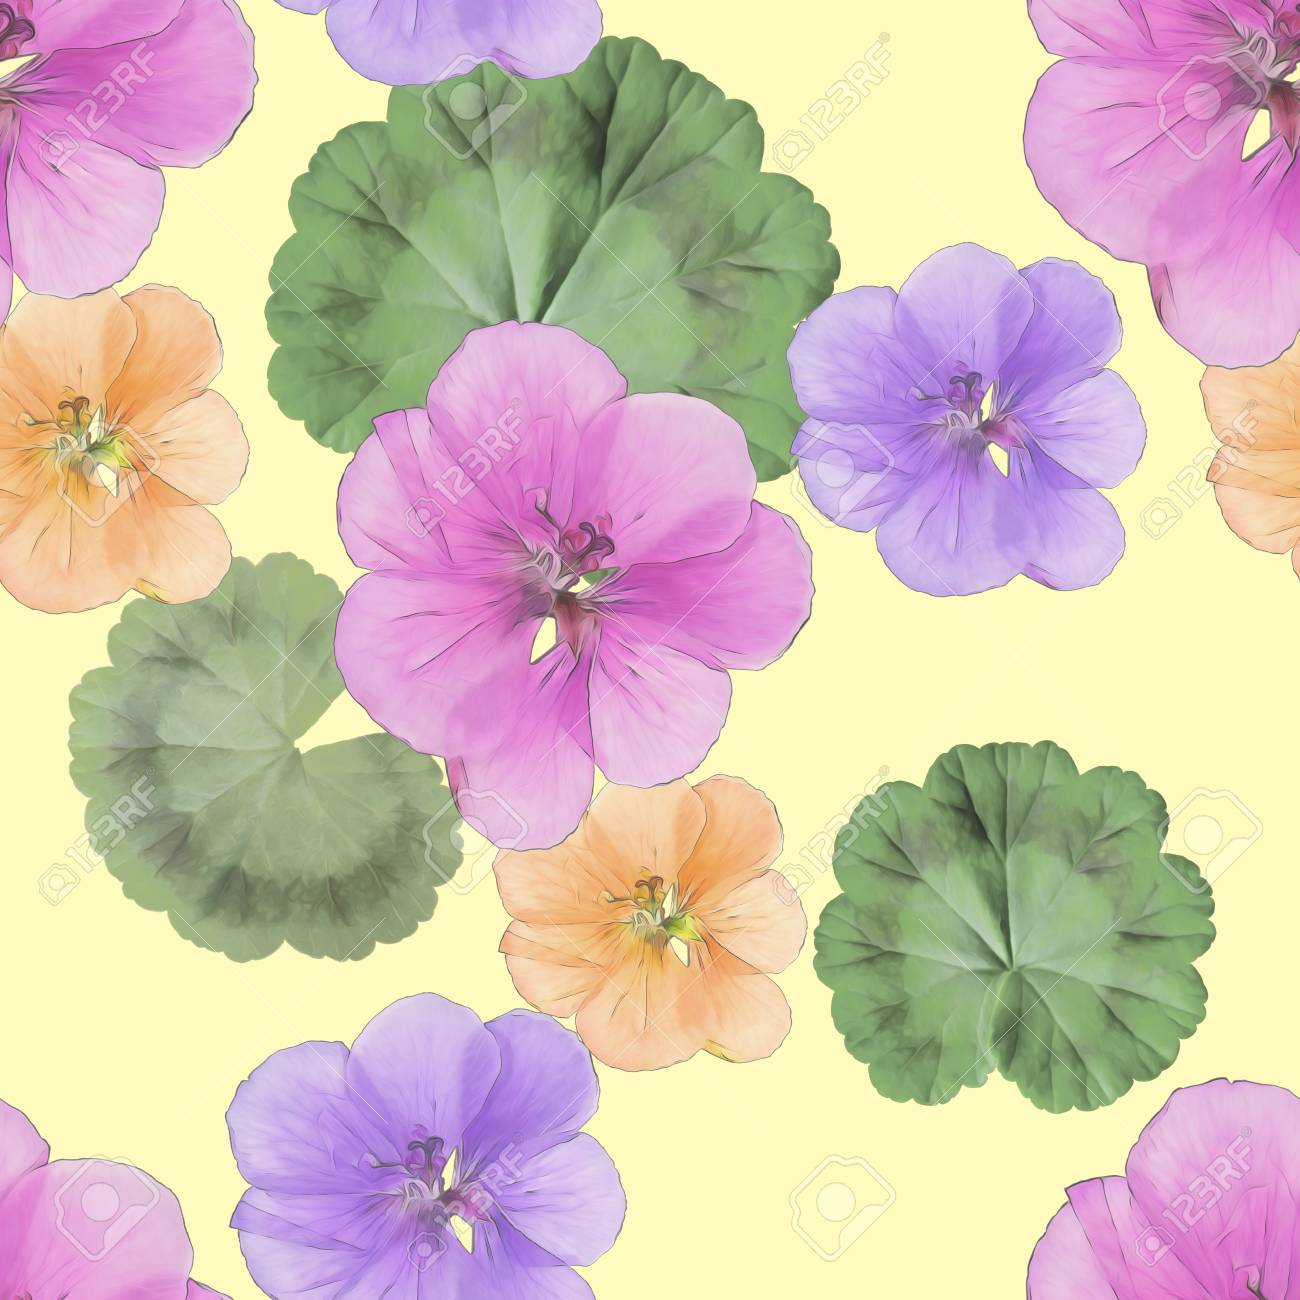 Geranium Pelargonium Texture Of Flowers Seamless Pattern For